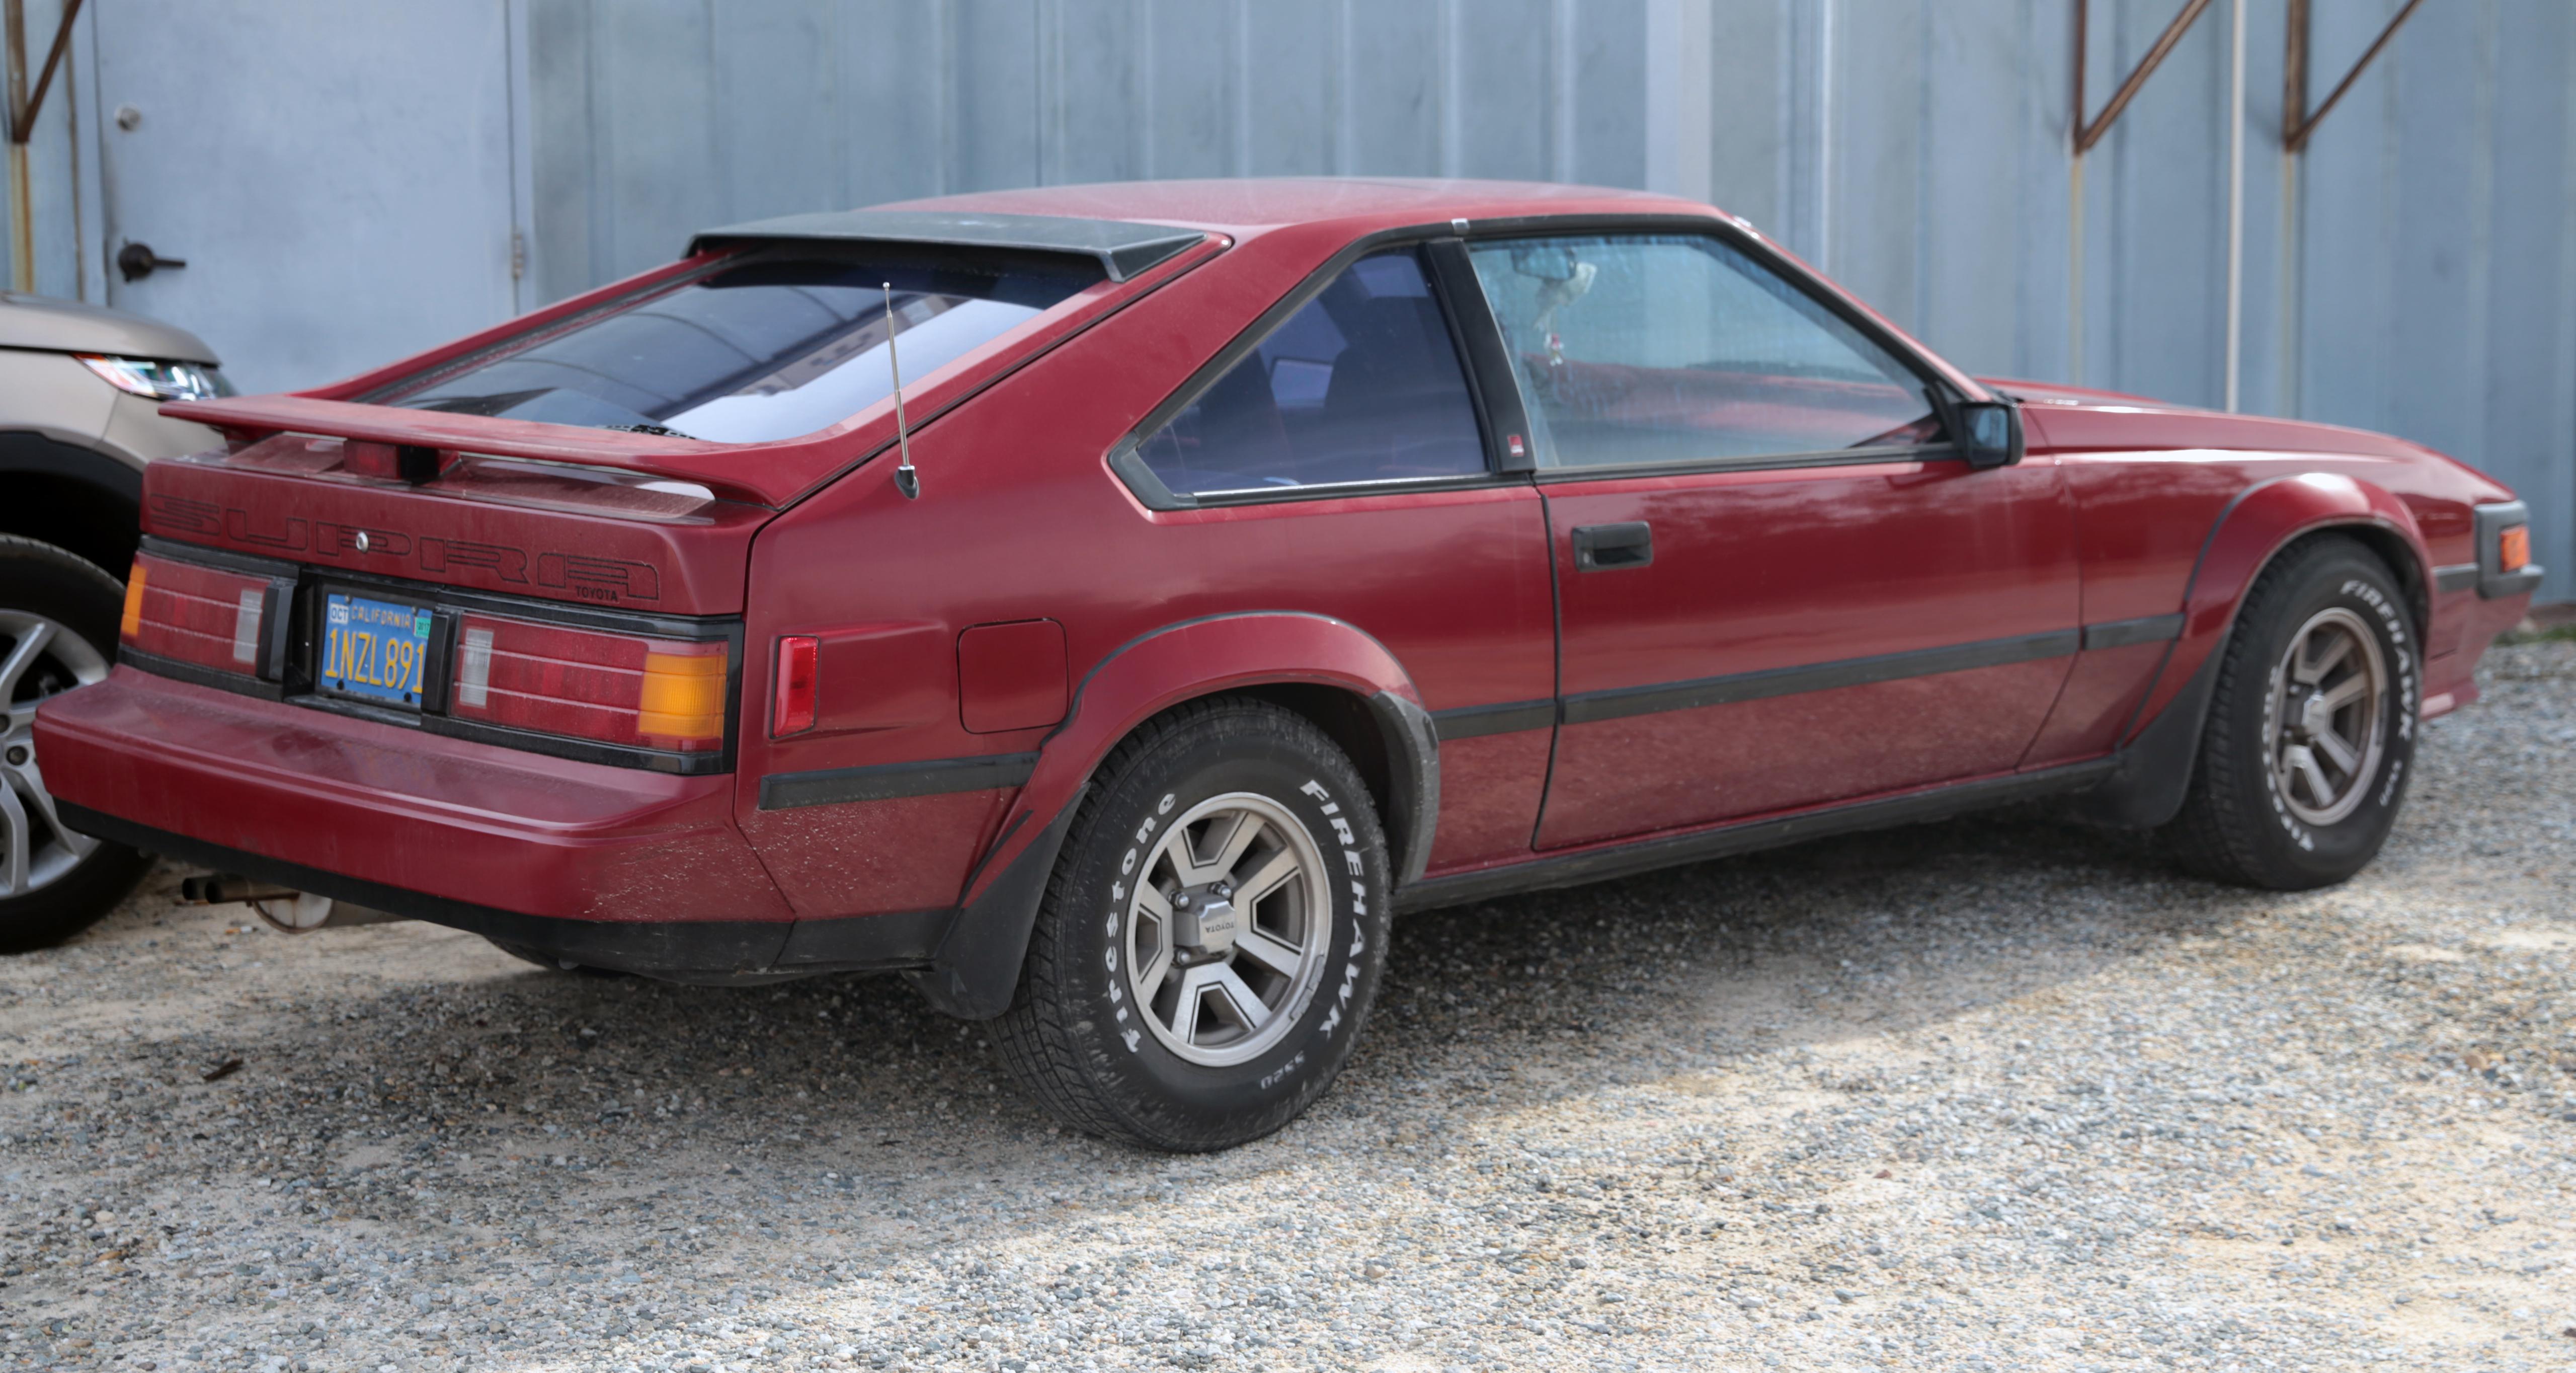 Toyota Supra III (A70) 1986 - 1993 Coupe #1